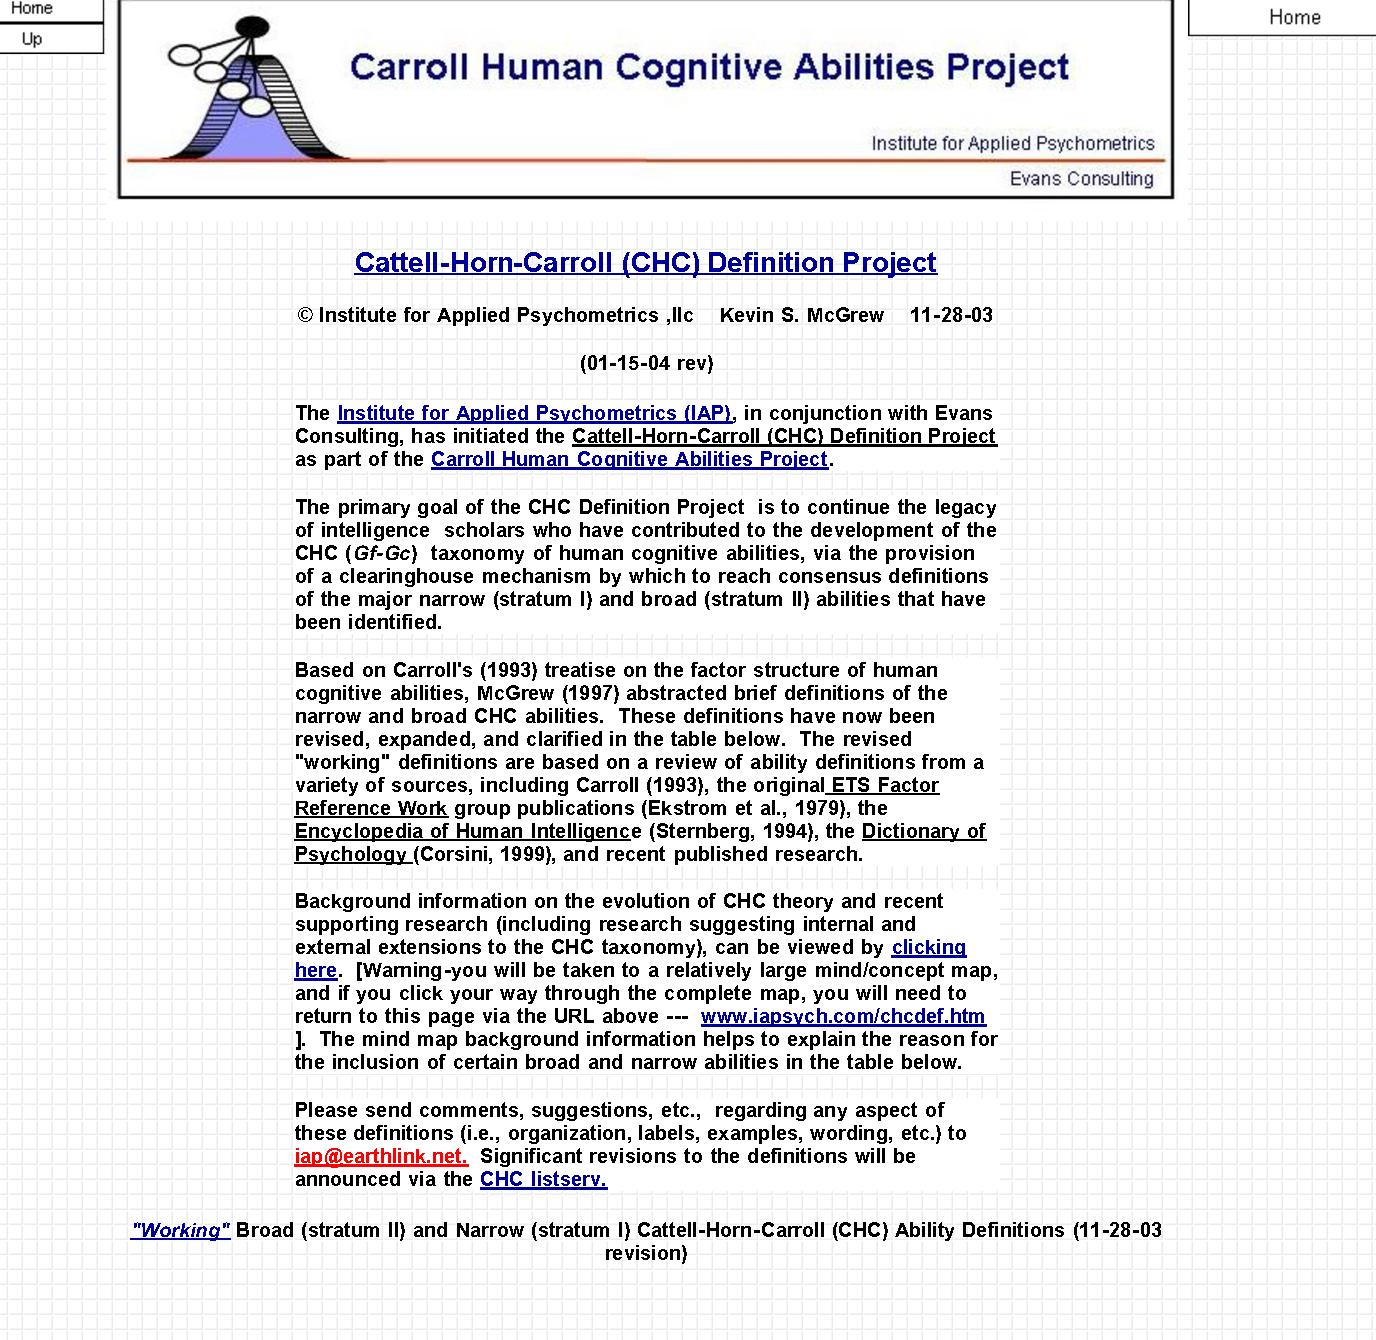 cattell-horn-carroll (chc) definition project - semantic scholar